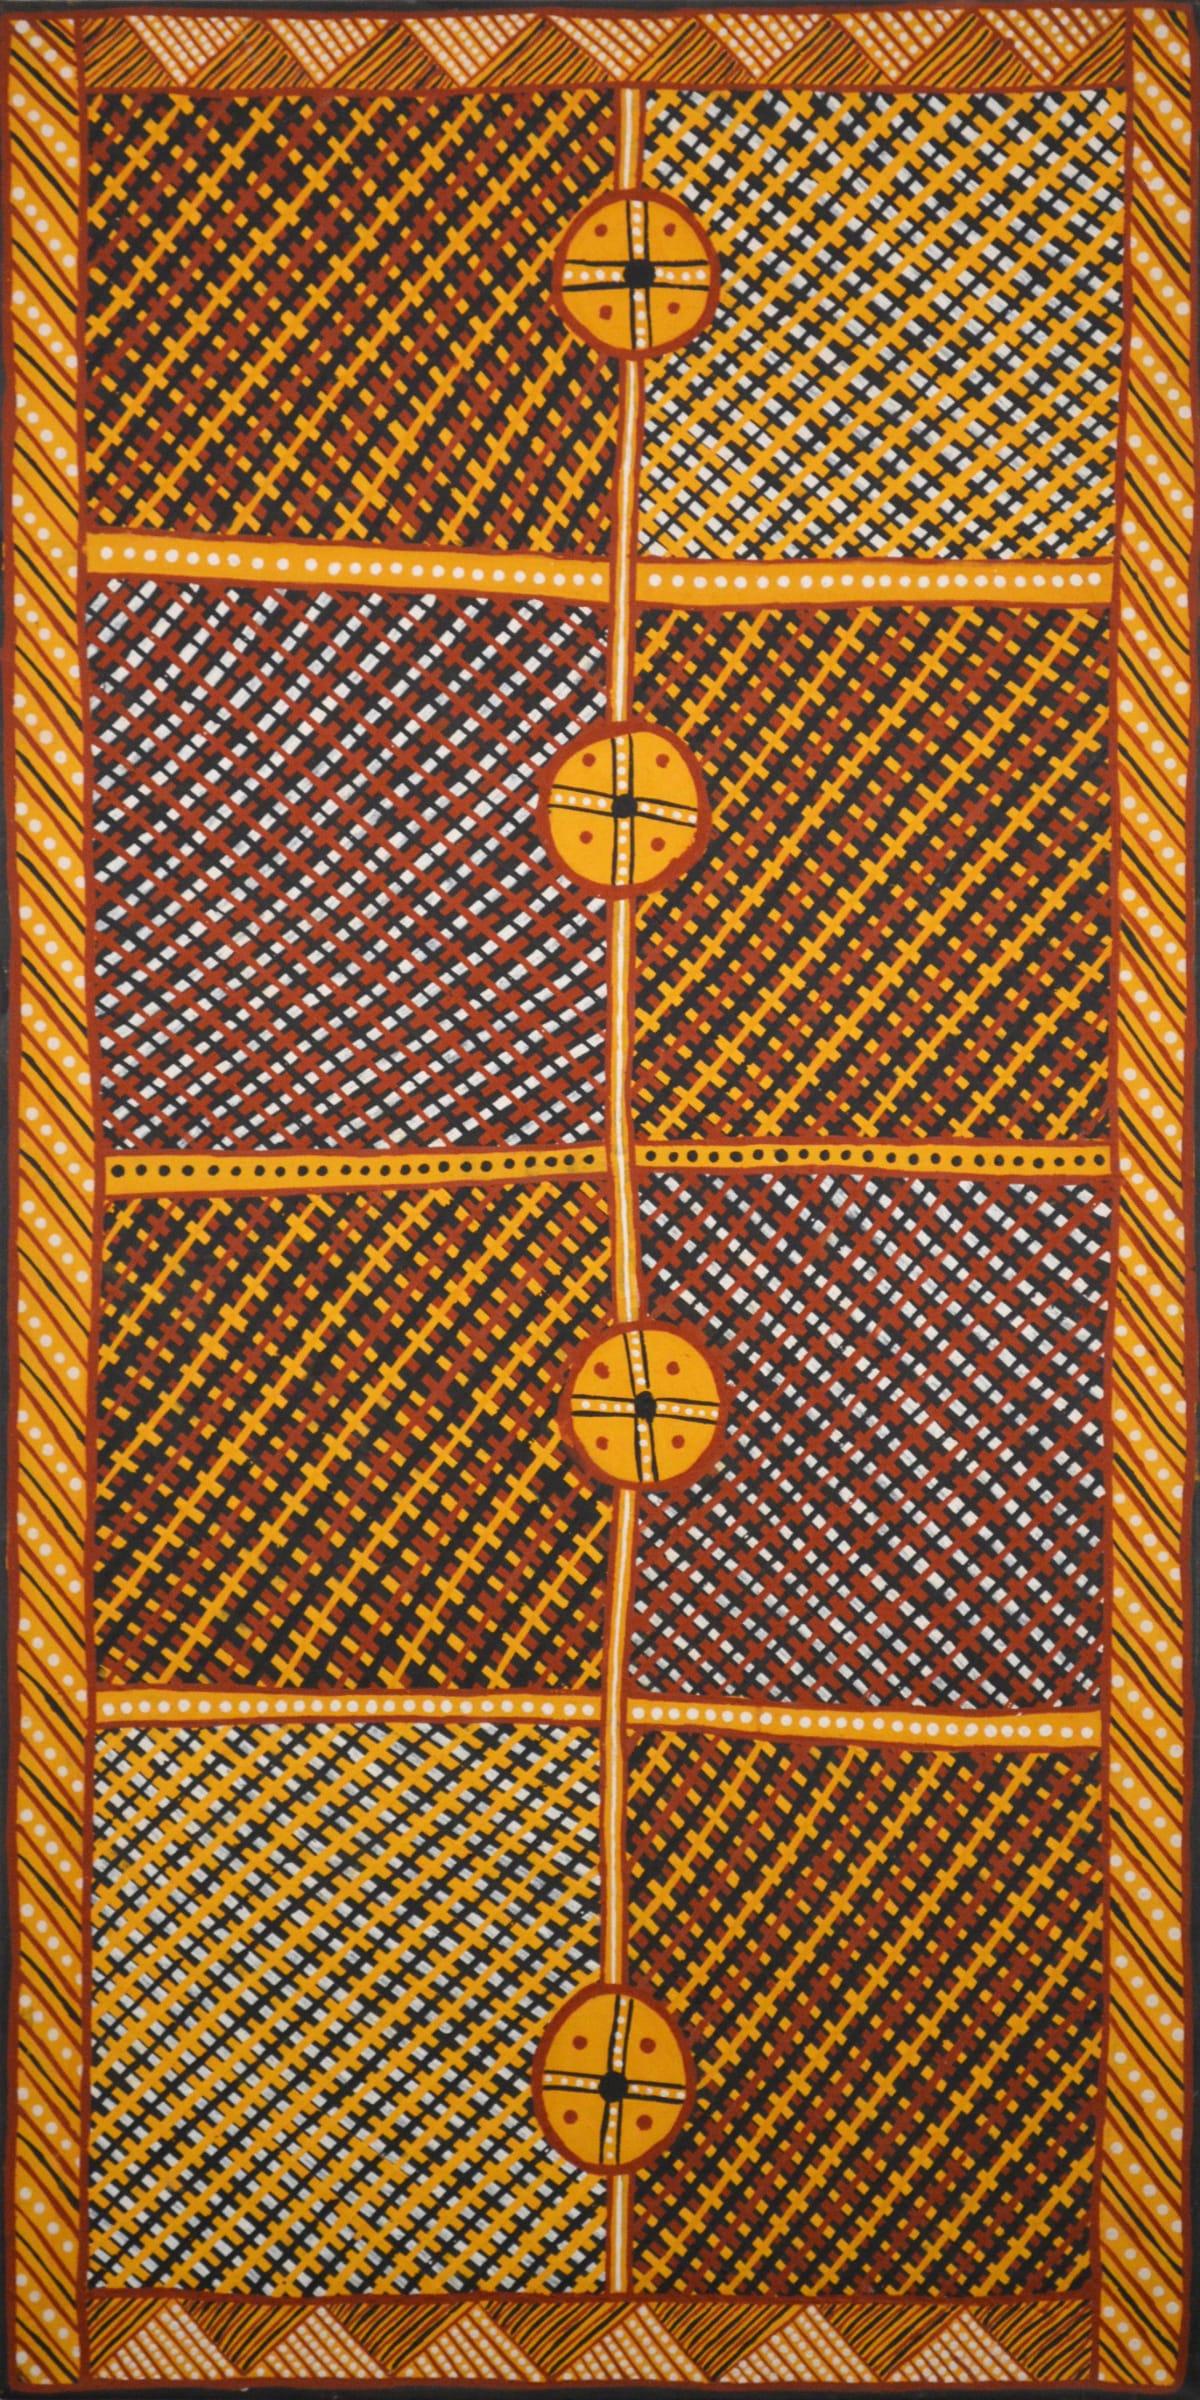 Raymond Bush Jilamara ochre on canvas 120 x 60 cm